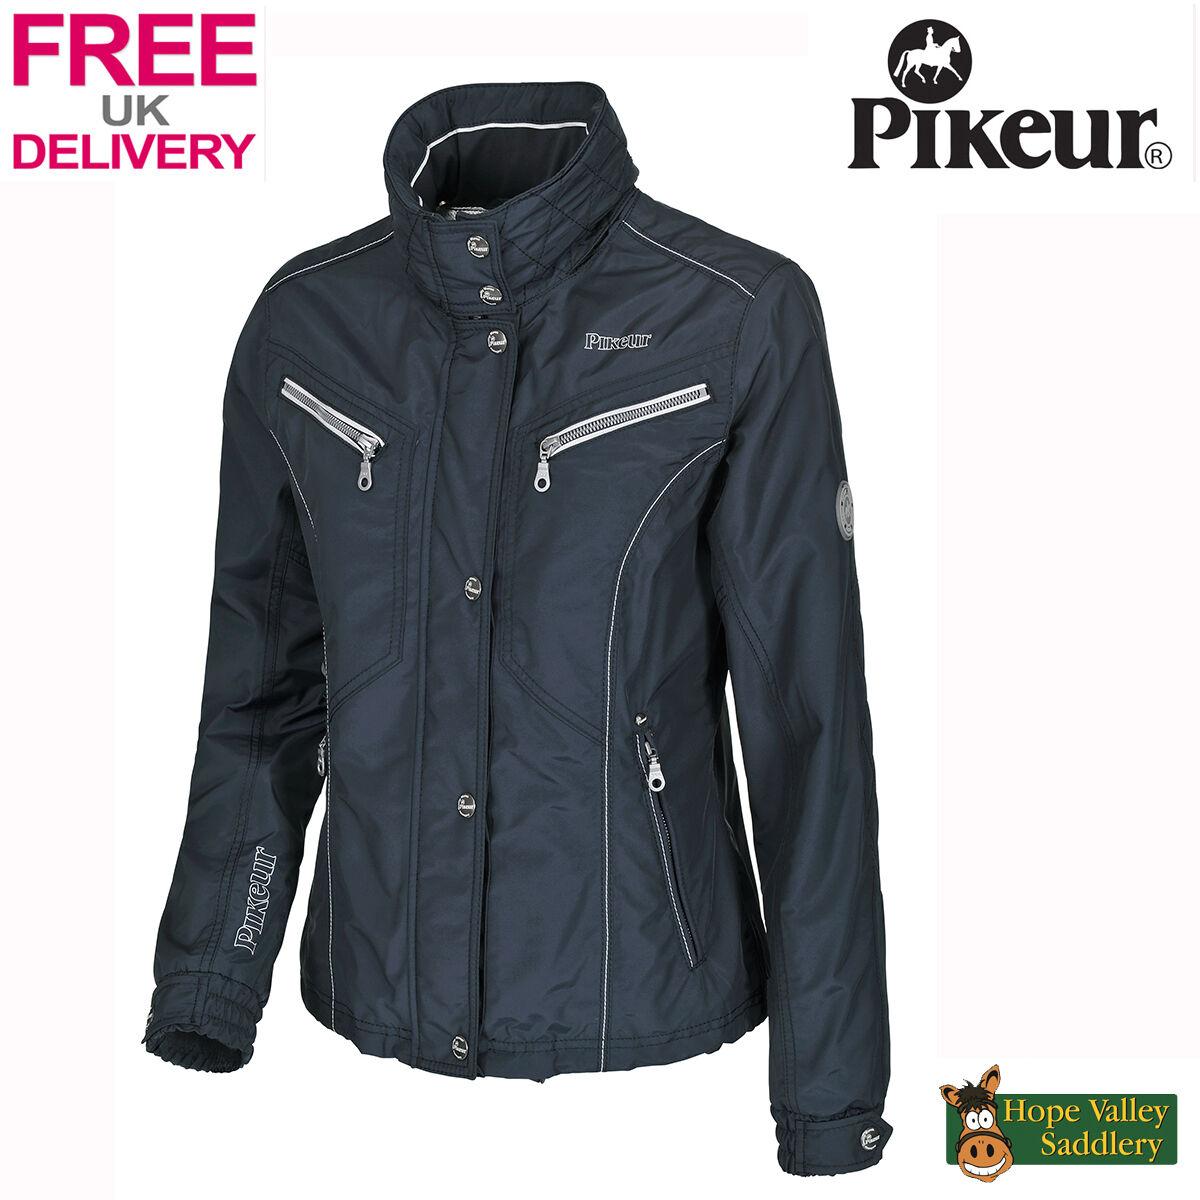 Pikeur Salima señoras chaqueta Impermeable (502001)  Envío Reino Unido